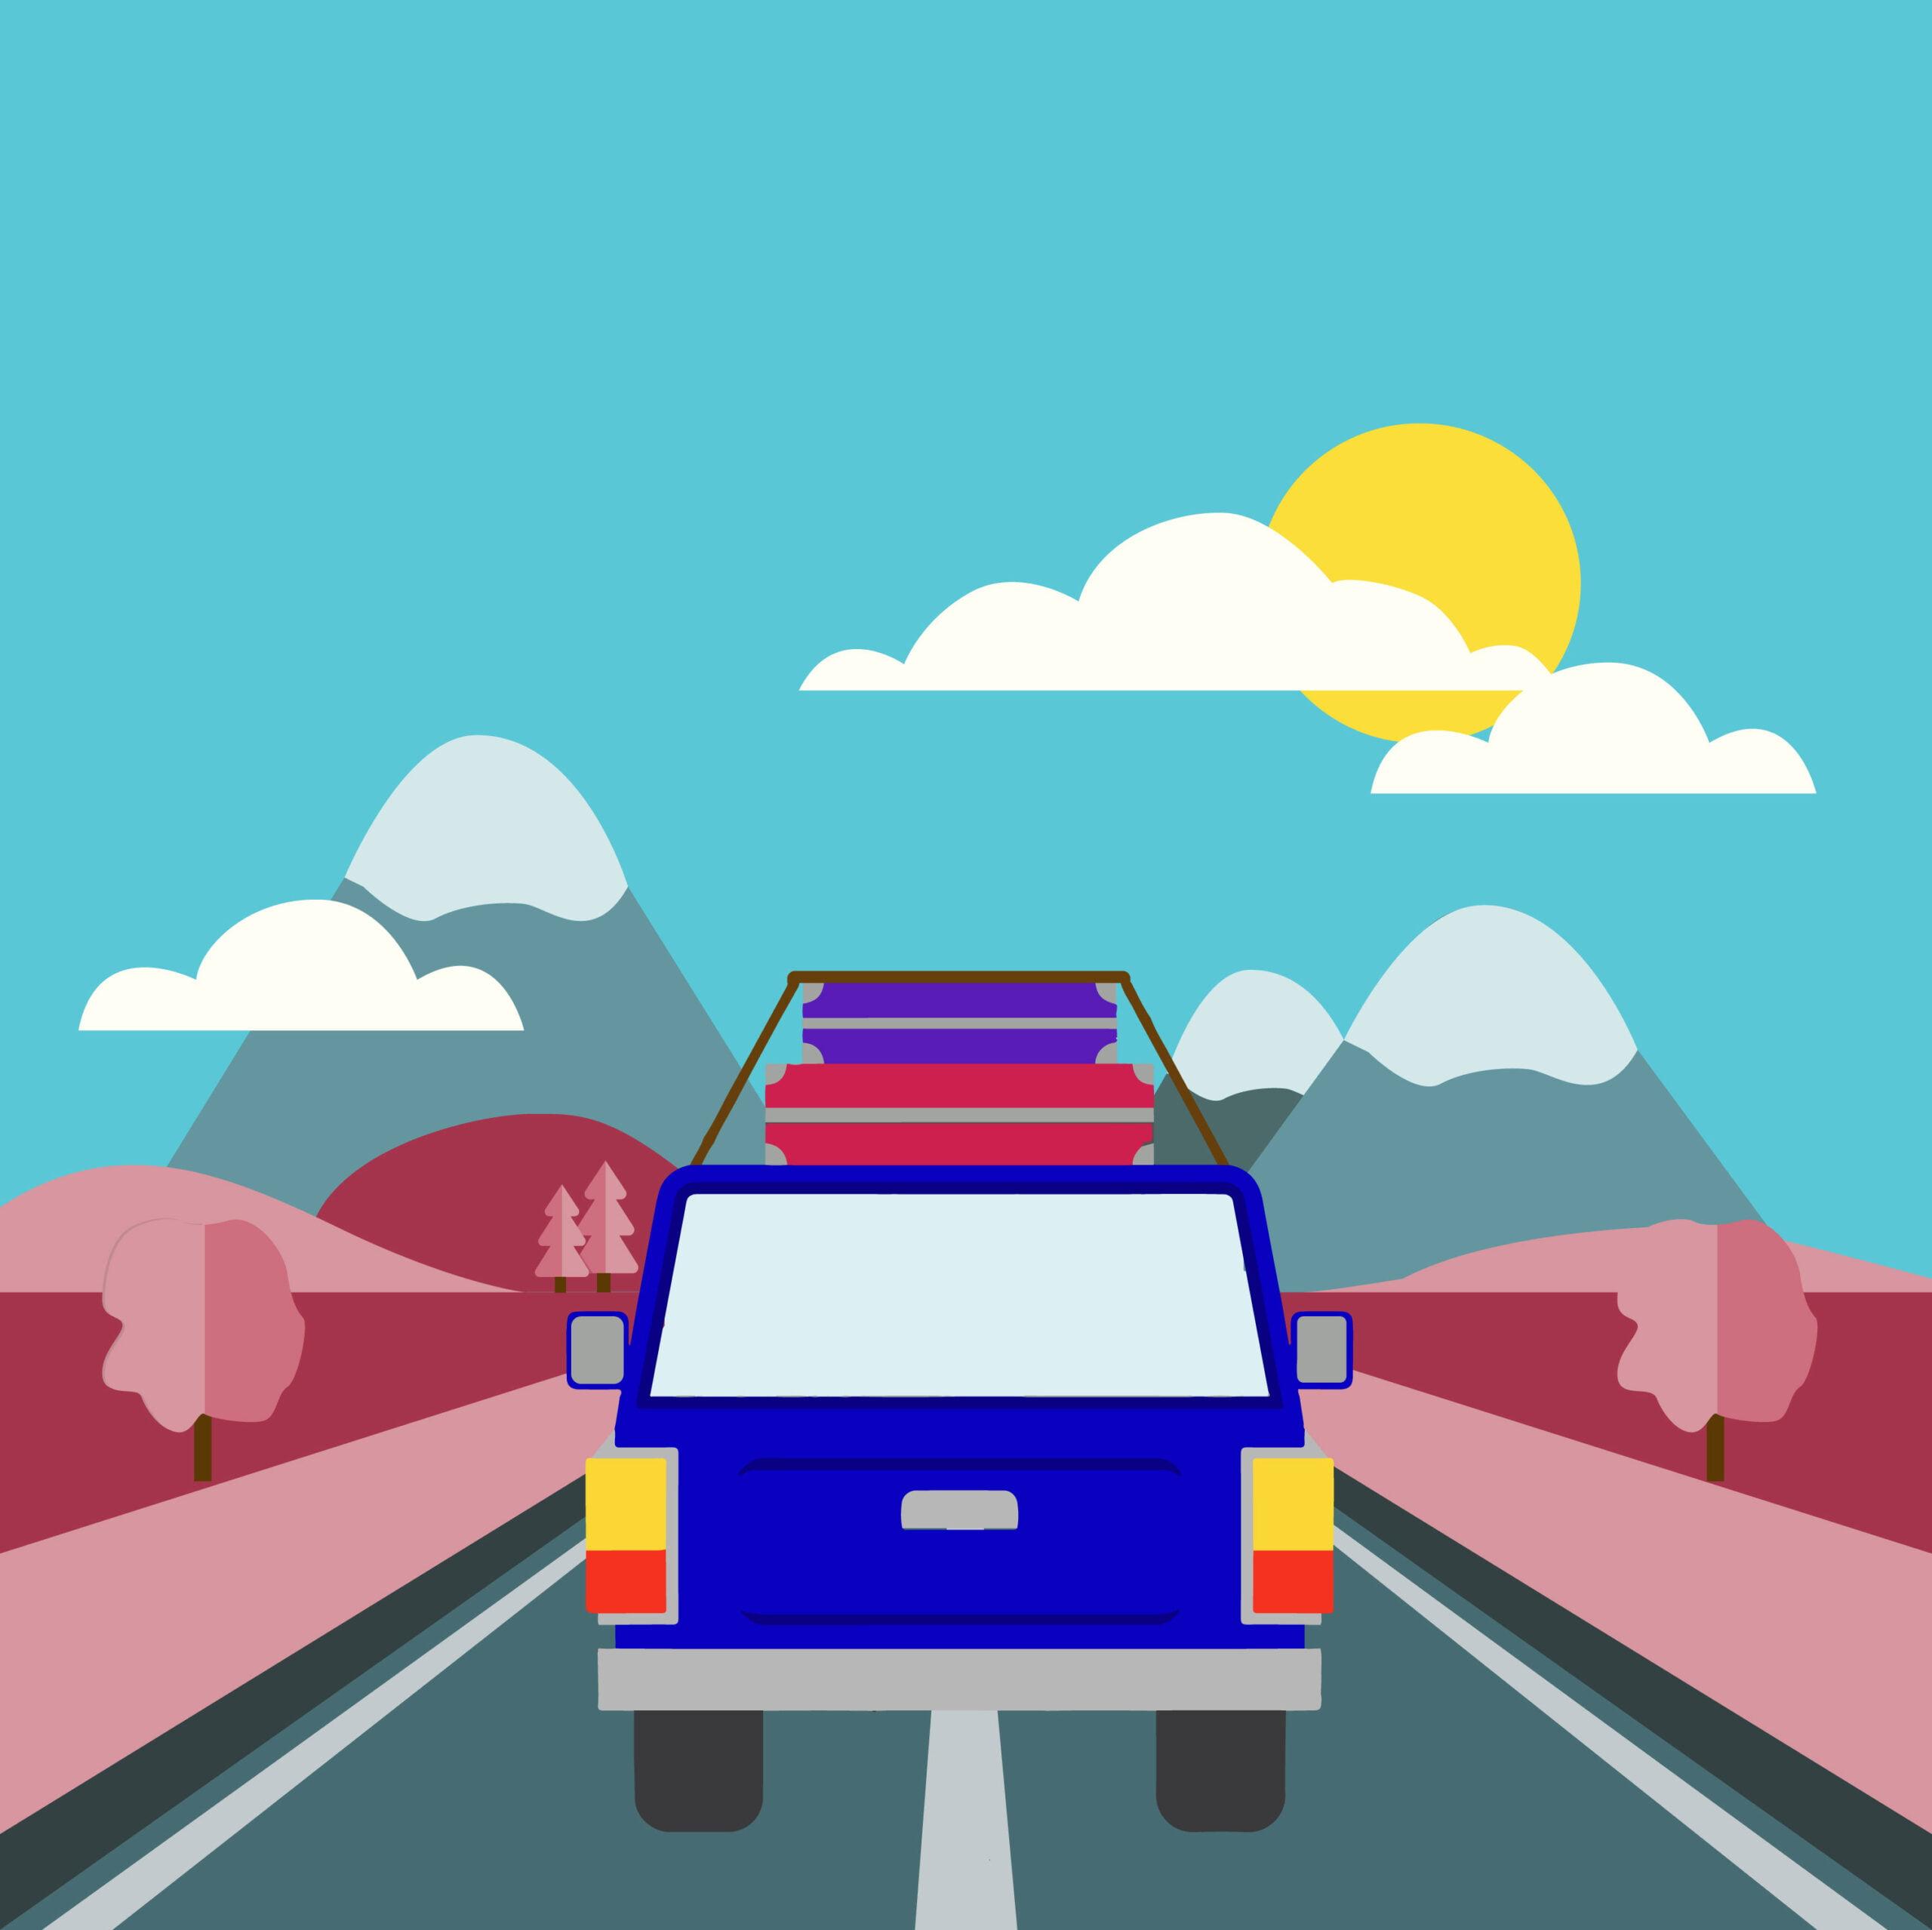 roadtrip illustration by Rita Azar for 360 Magazine